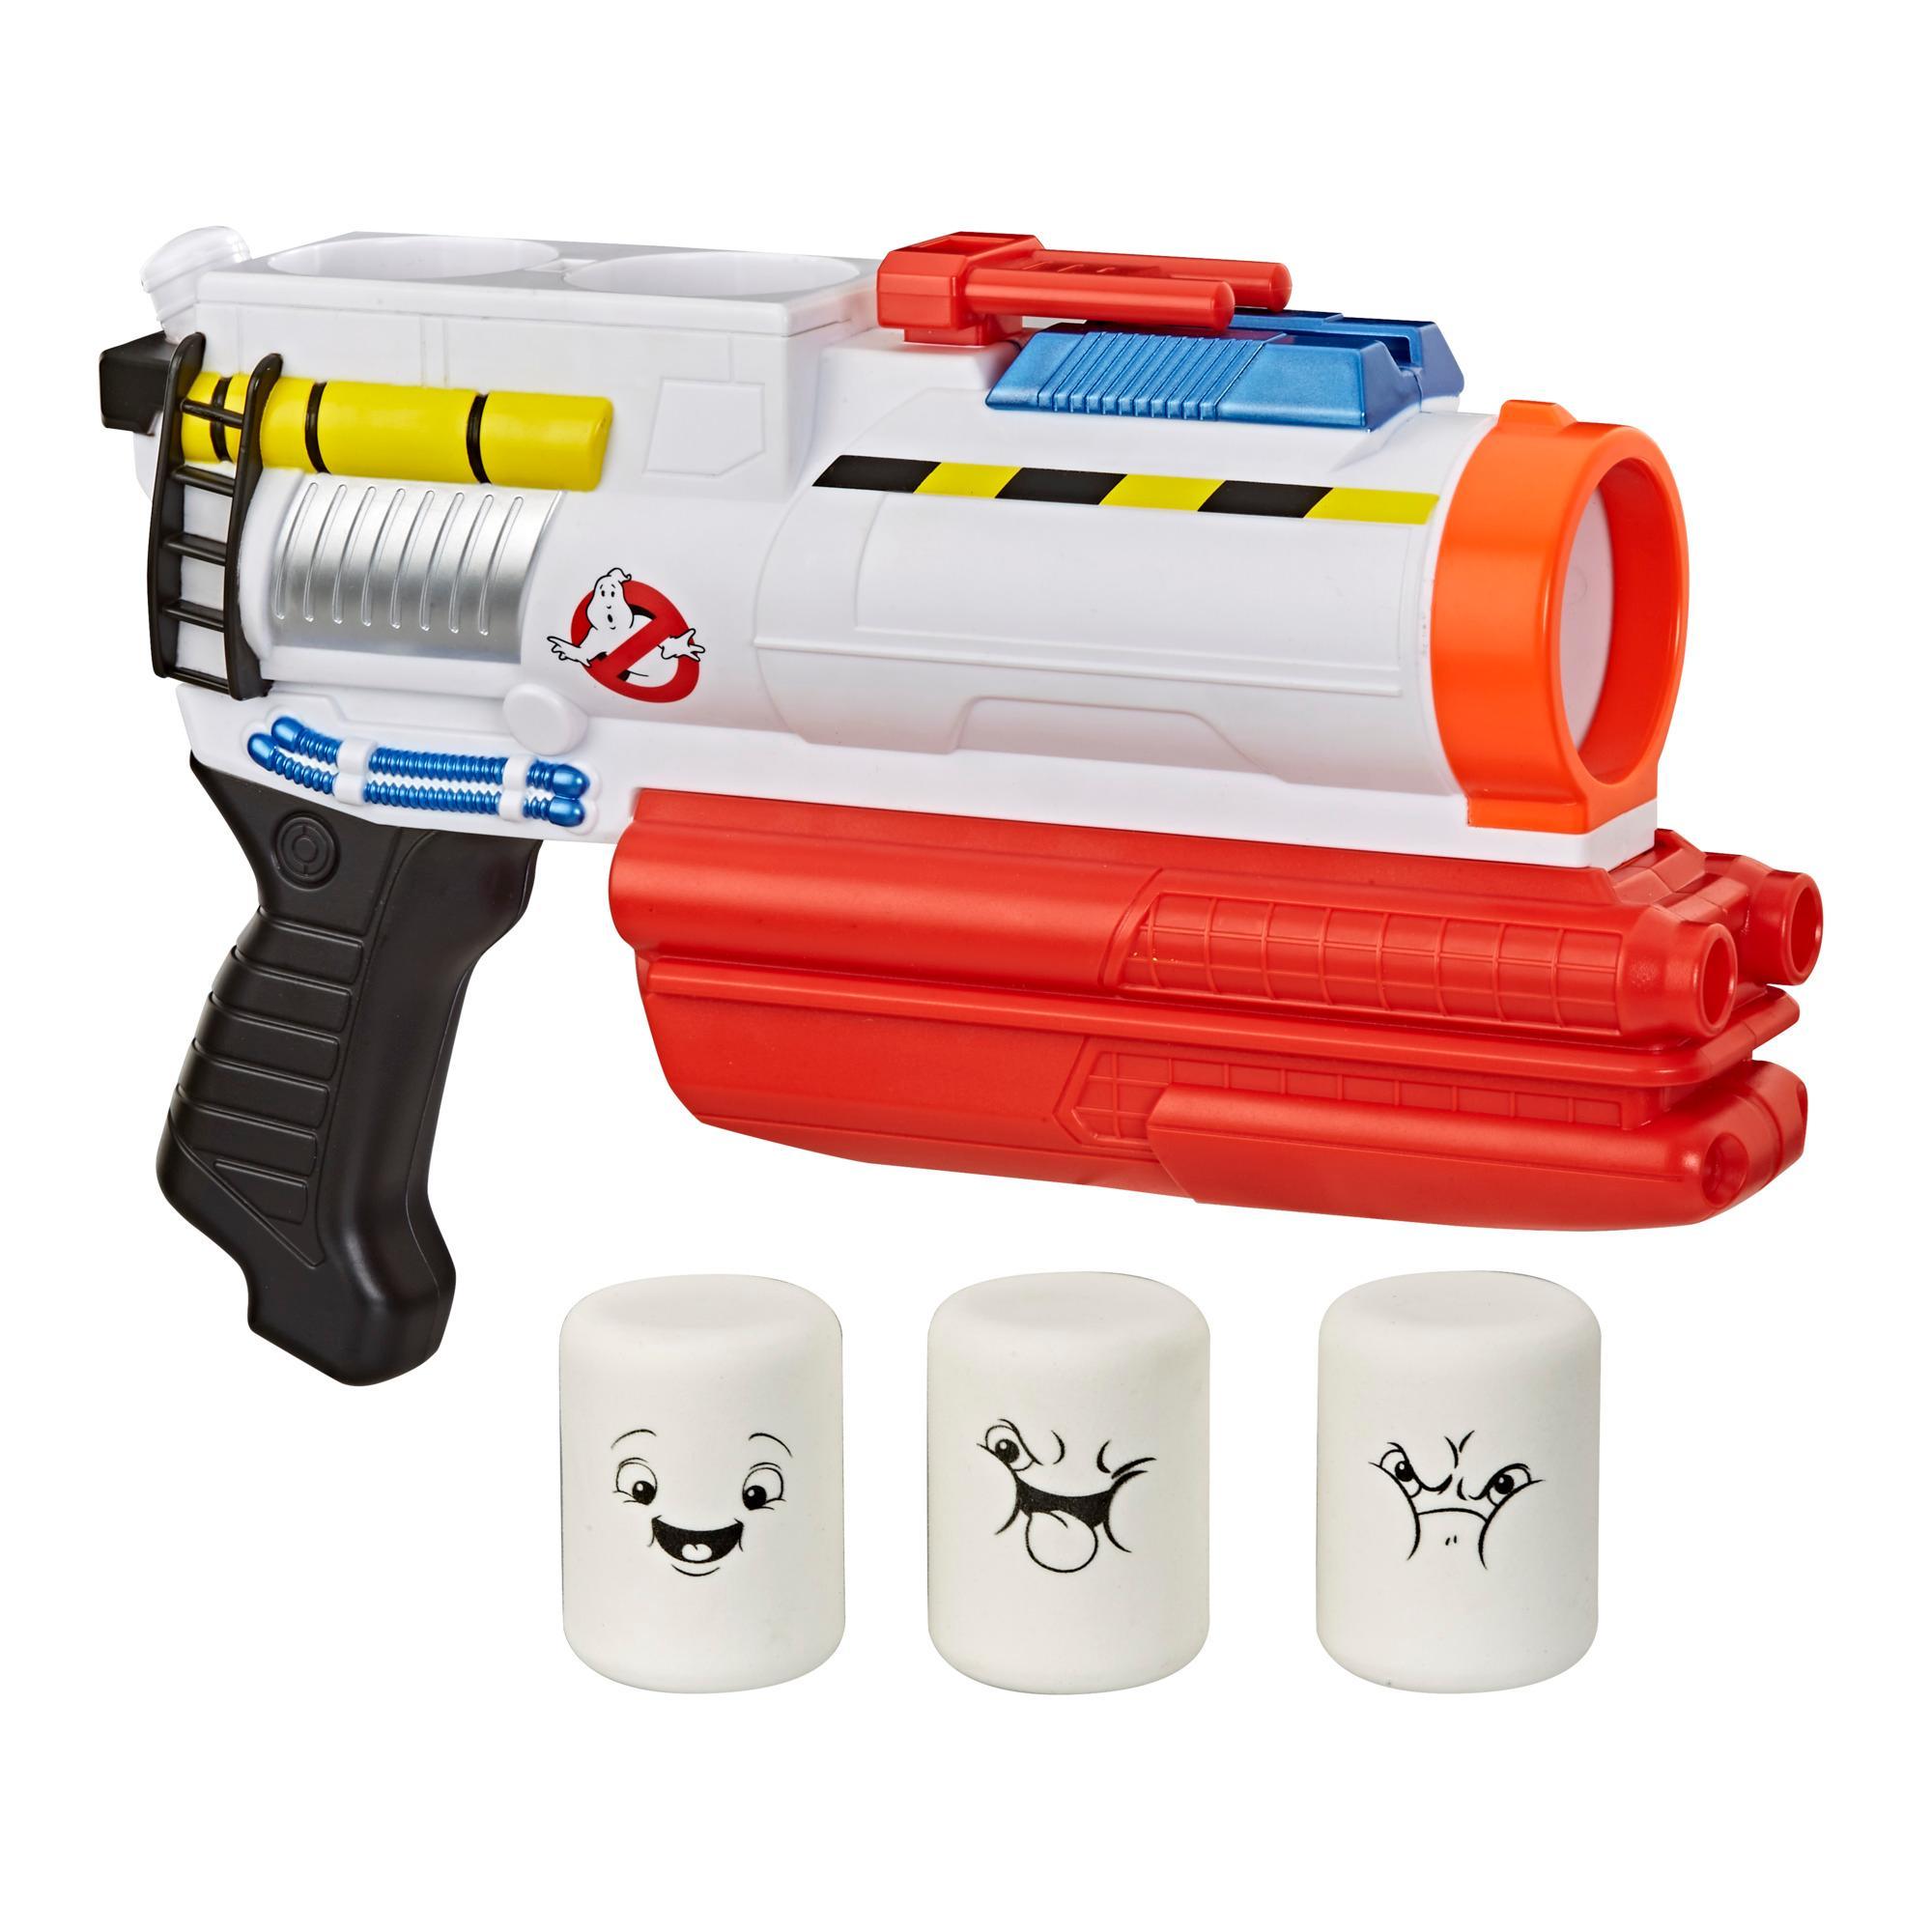 Ghostbusters Mini-Marshmallow Blaster